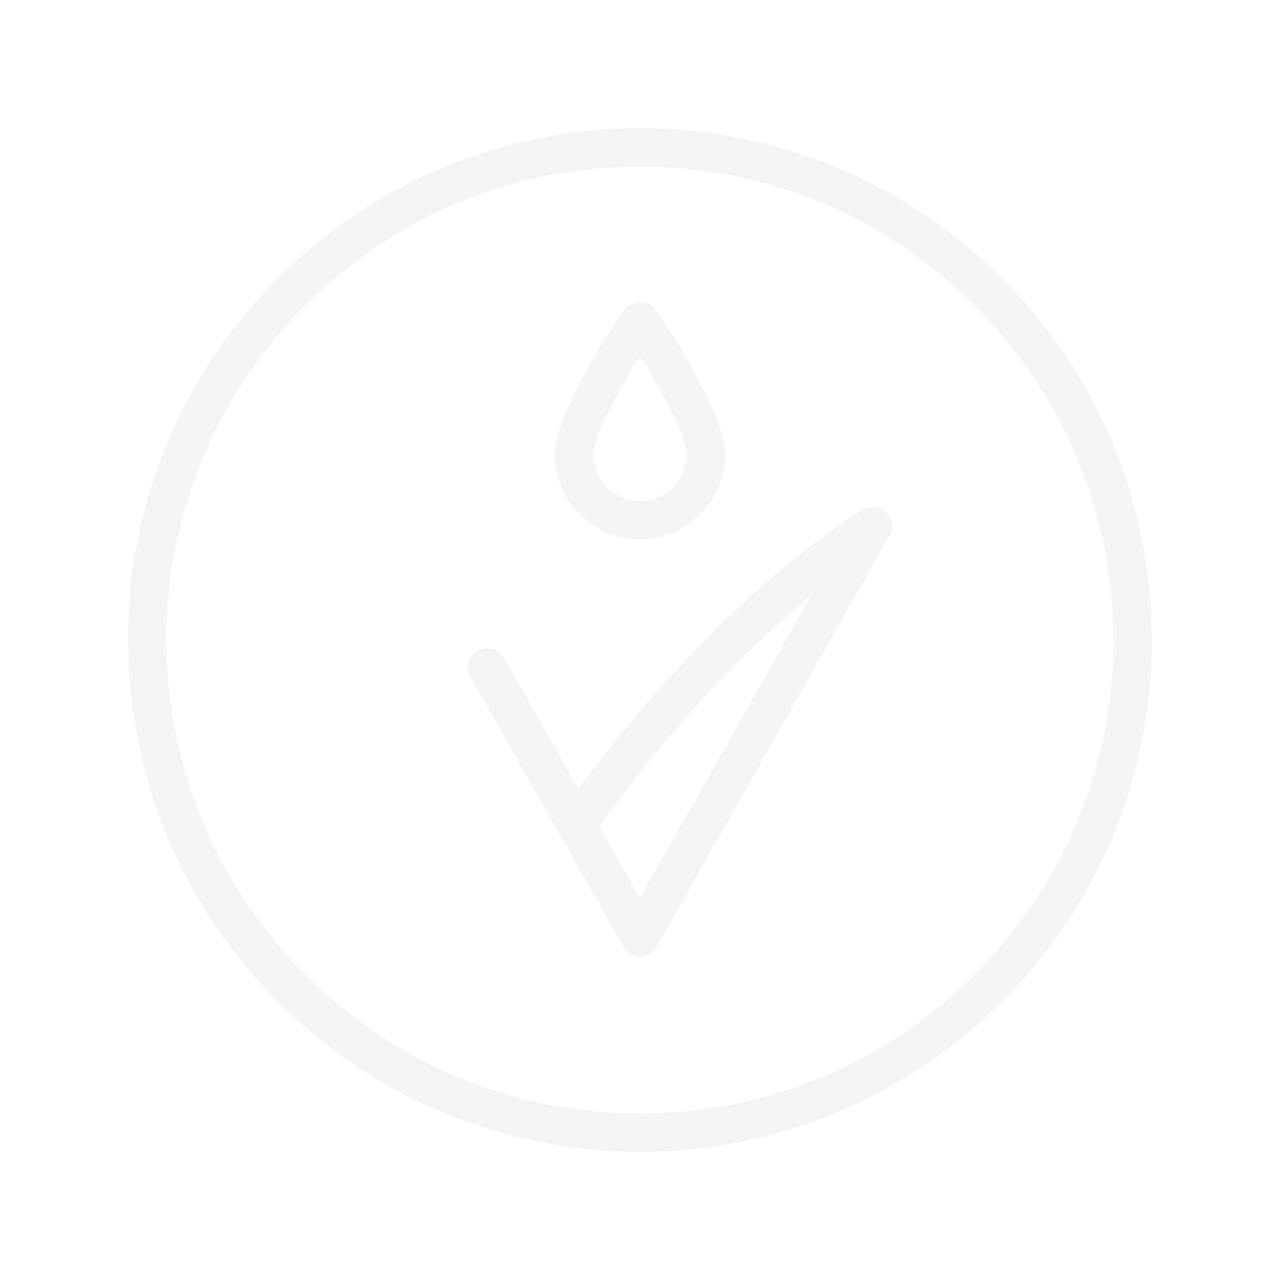 SHISEIDO Waso Color-Smart Oil-Free Day Moisturizer SPF30 50ml